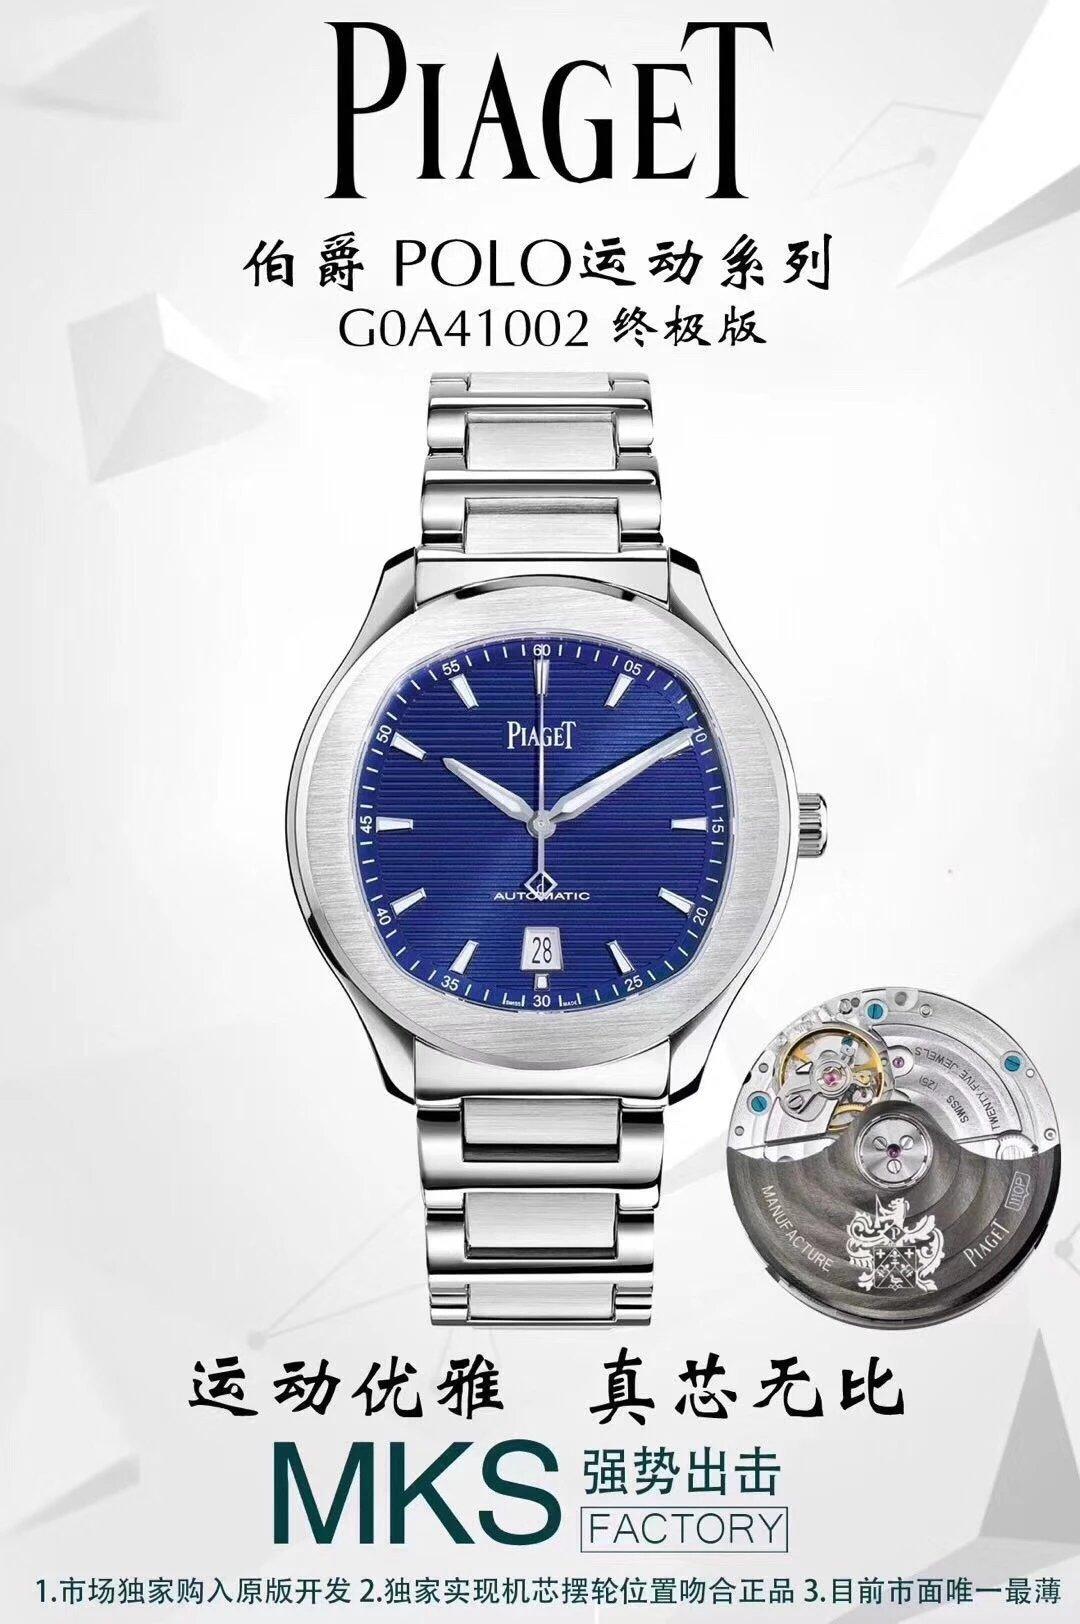 MKS卓越成就??集运动休闲 商务正装一身的PIAGET?POLO'S系列 男士机械手表